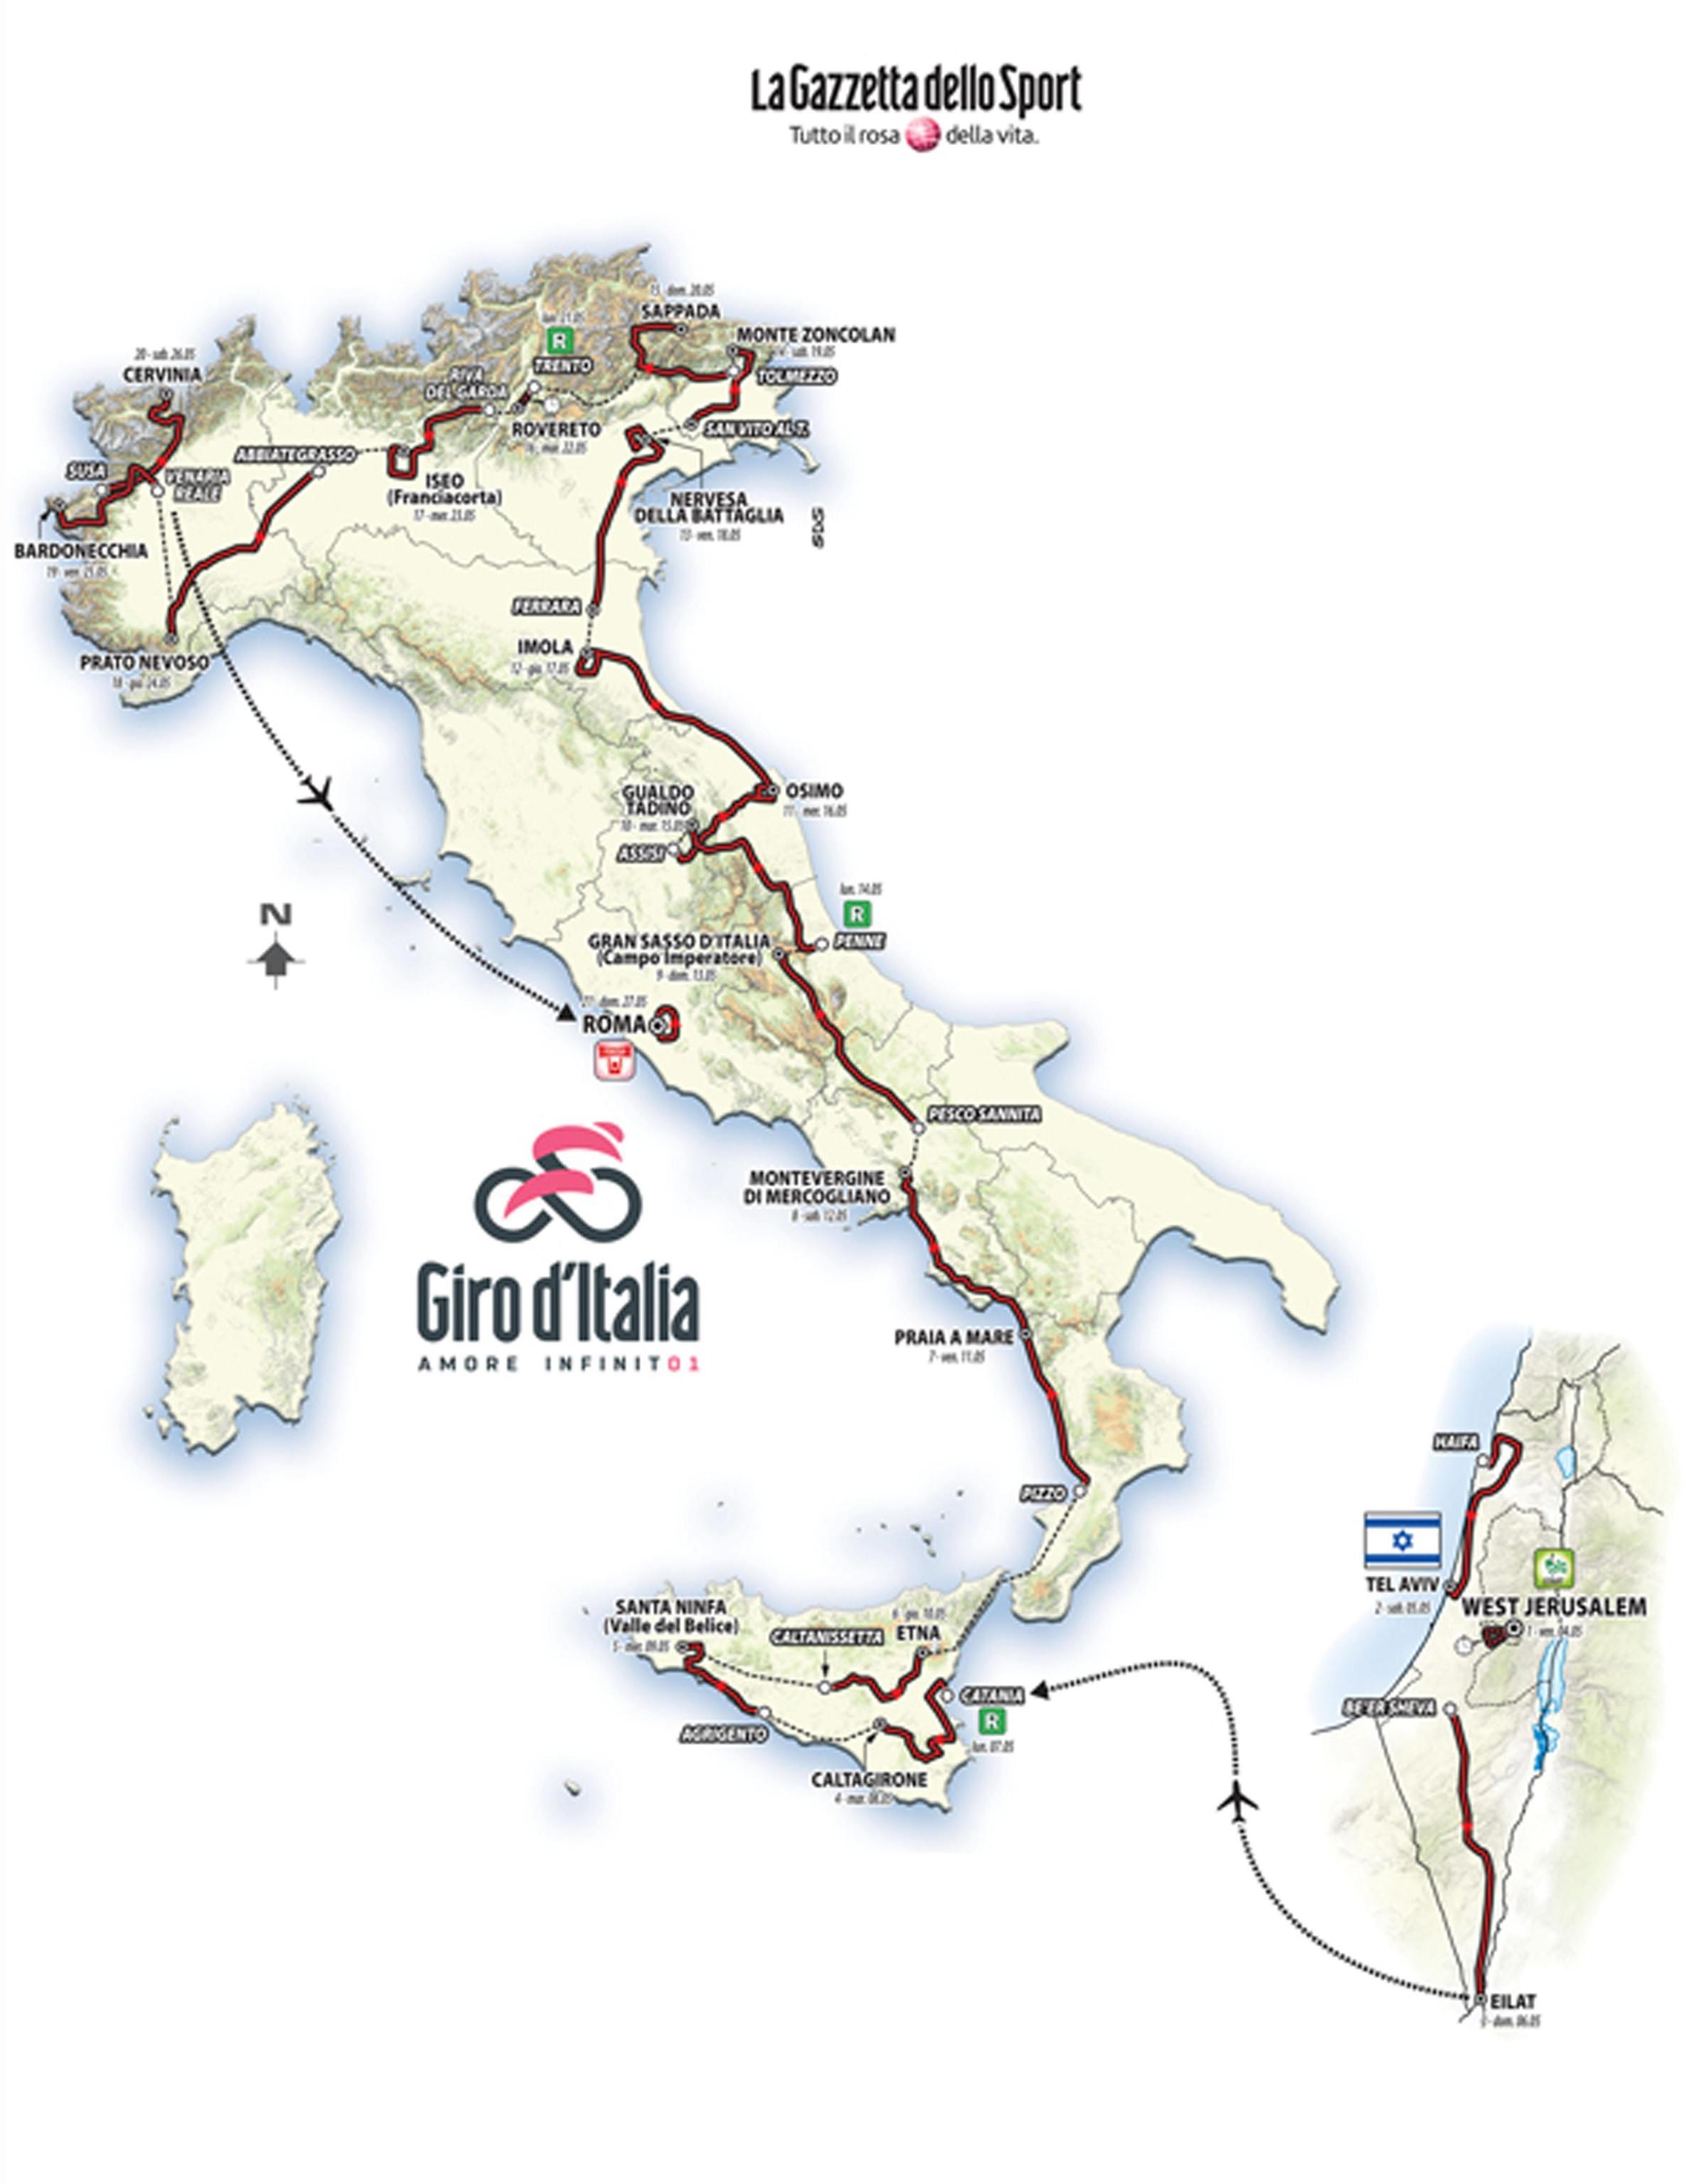 Calendario Giro D Italia.Giro D Italia 2018 Il Calendario Delle Tappe Virgilio Sport